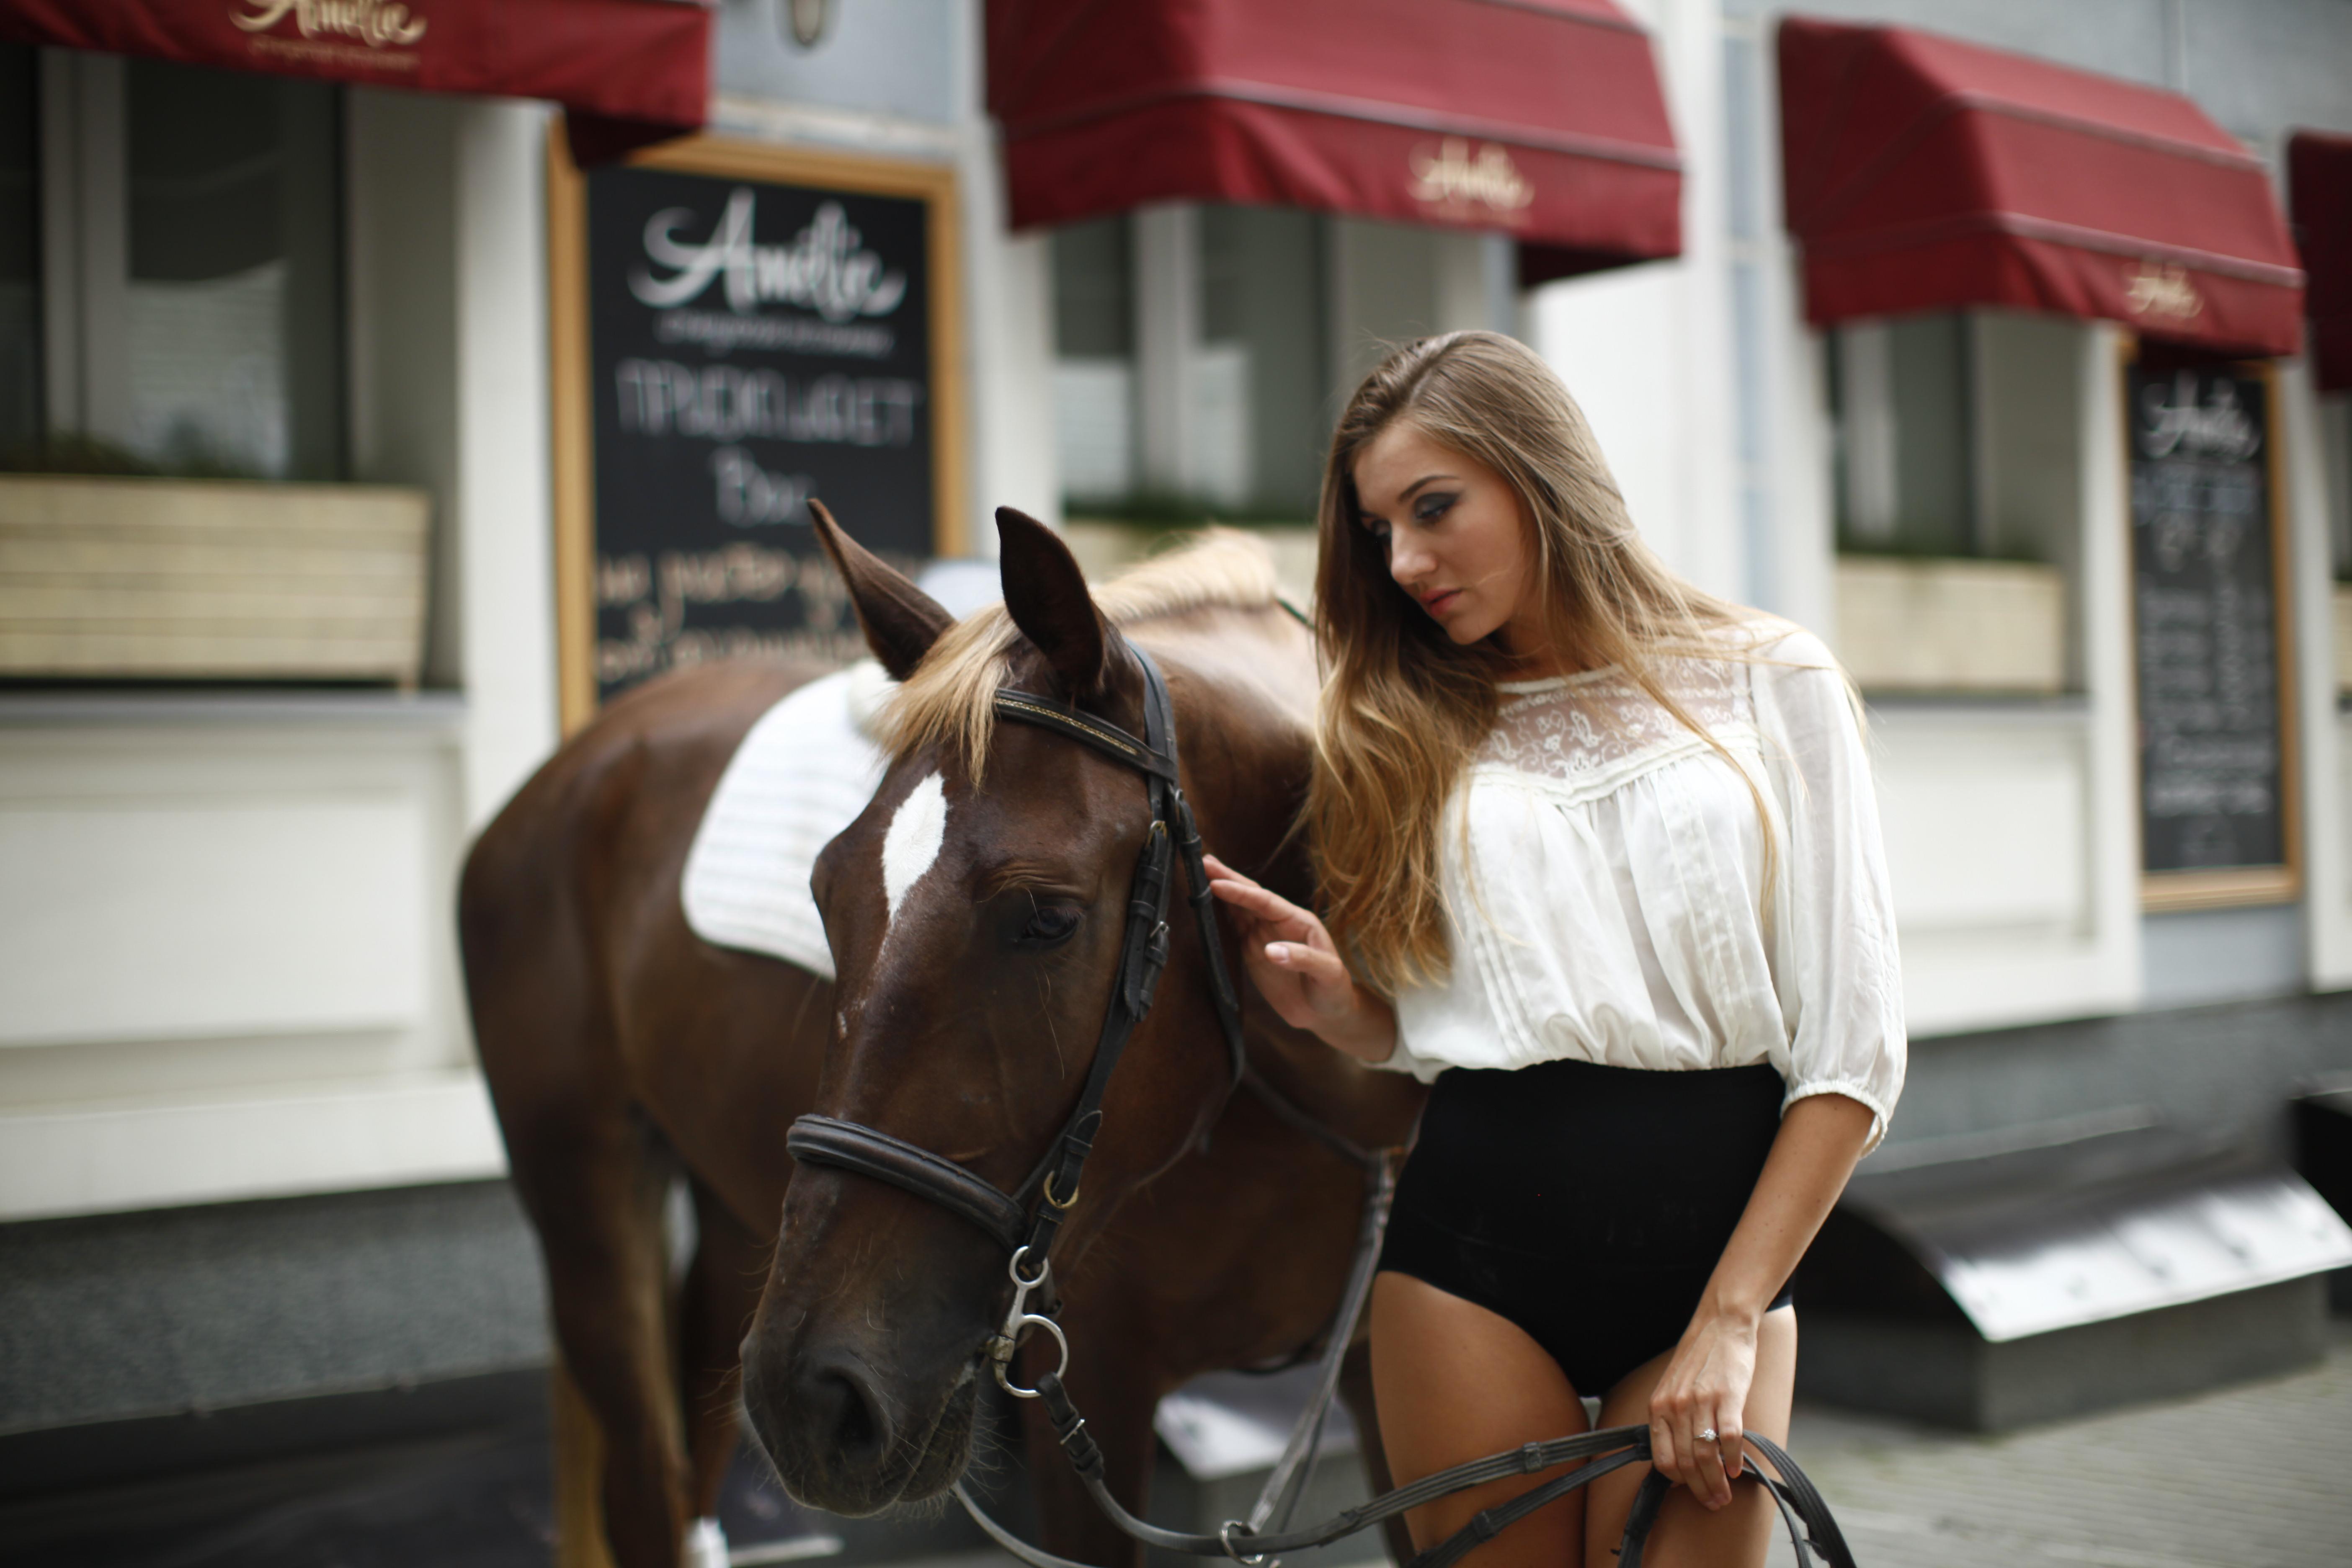 Miss Rider